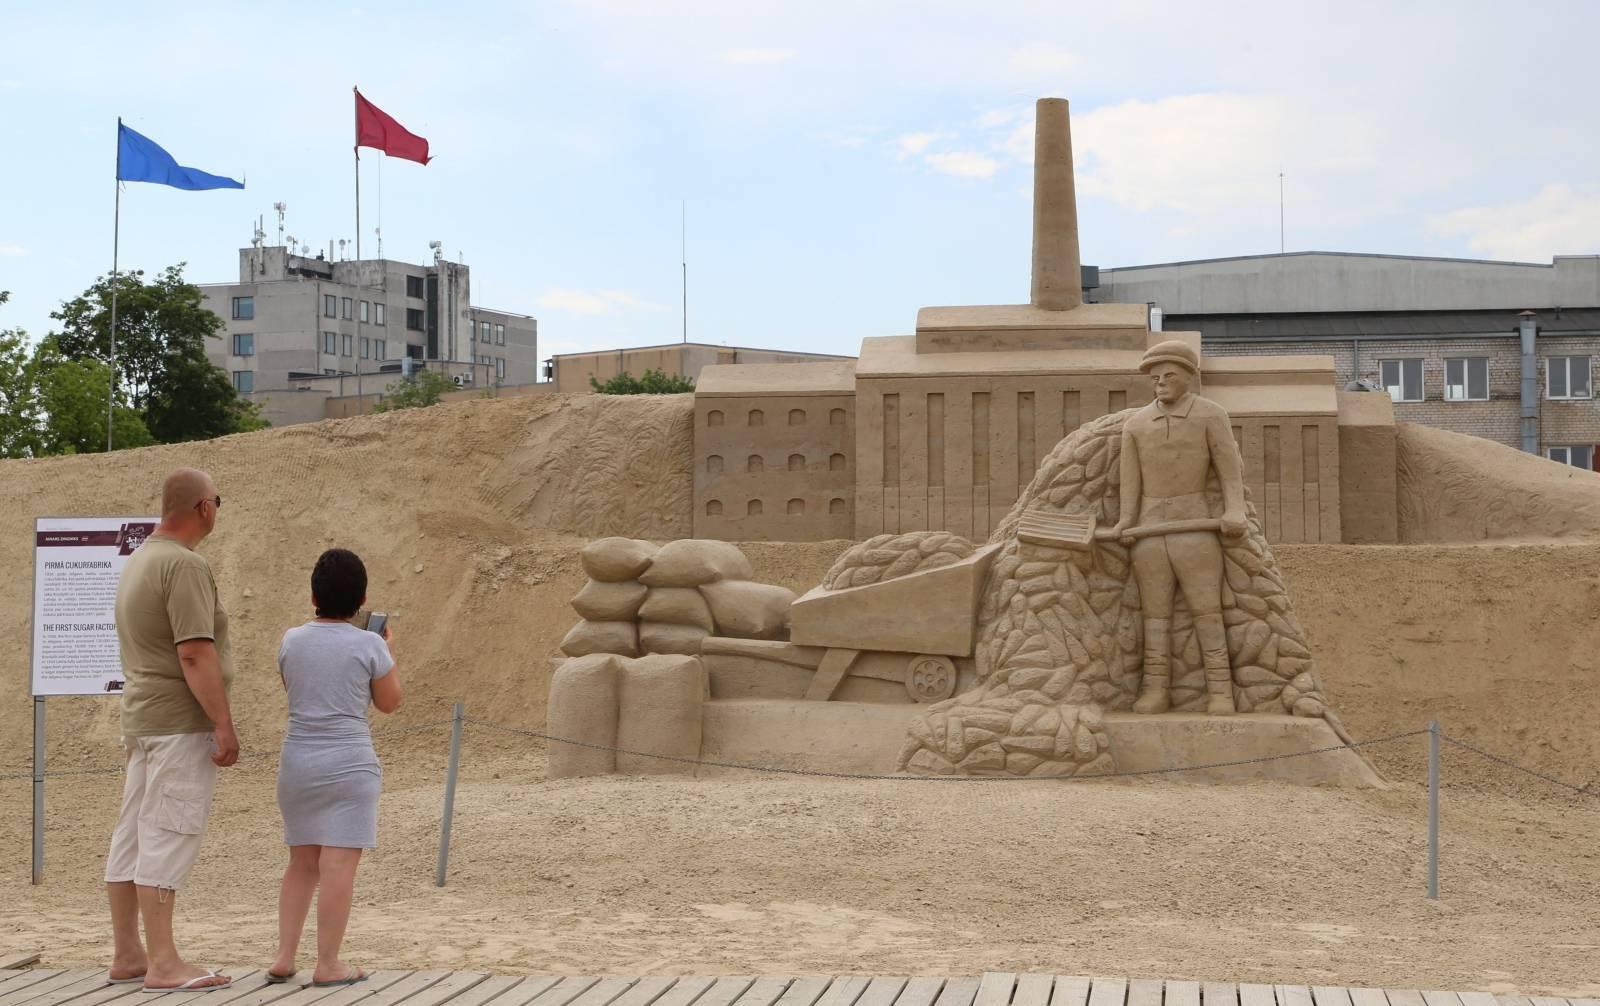 Sand Sculpture Exhibition in Latvia